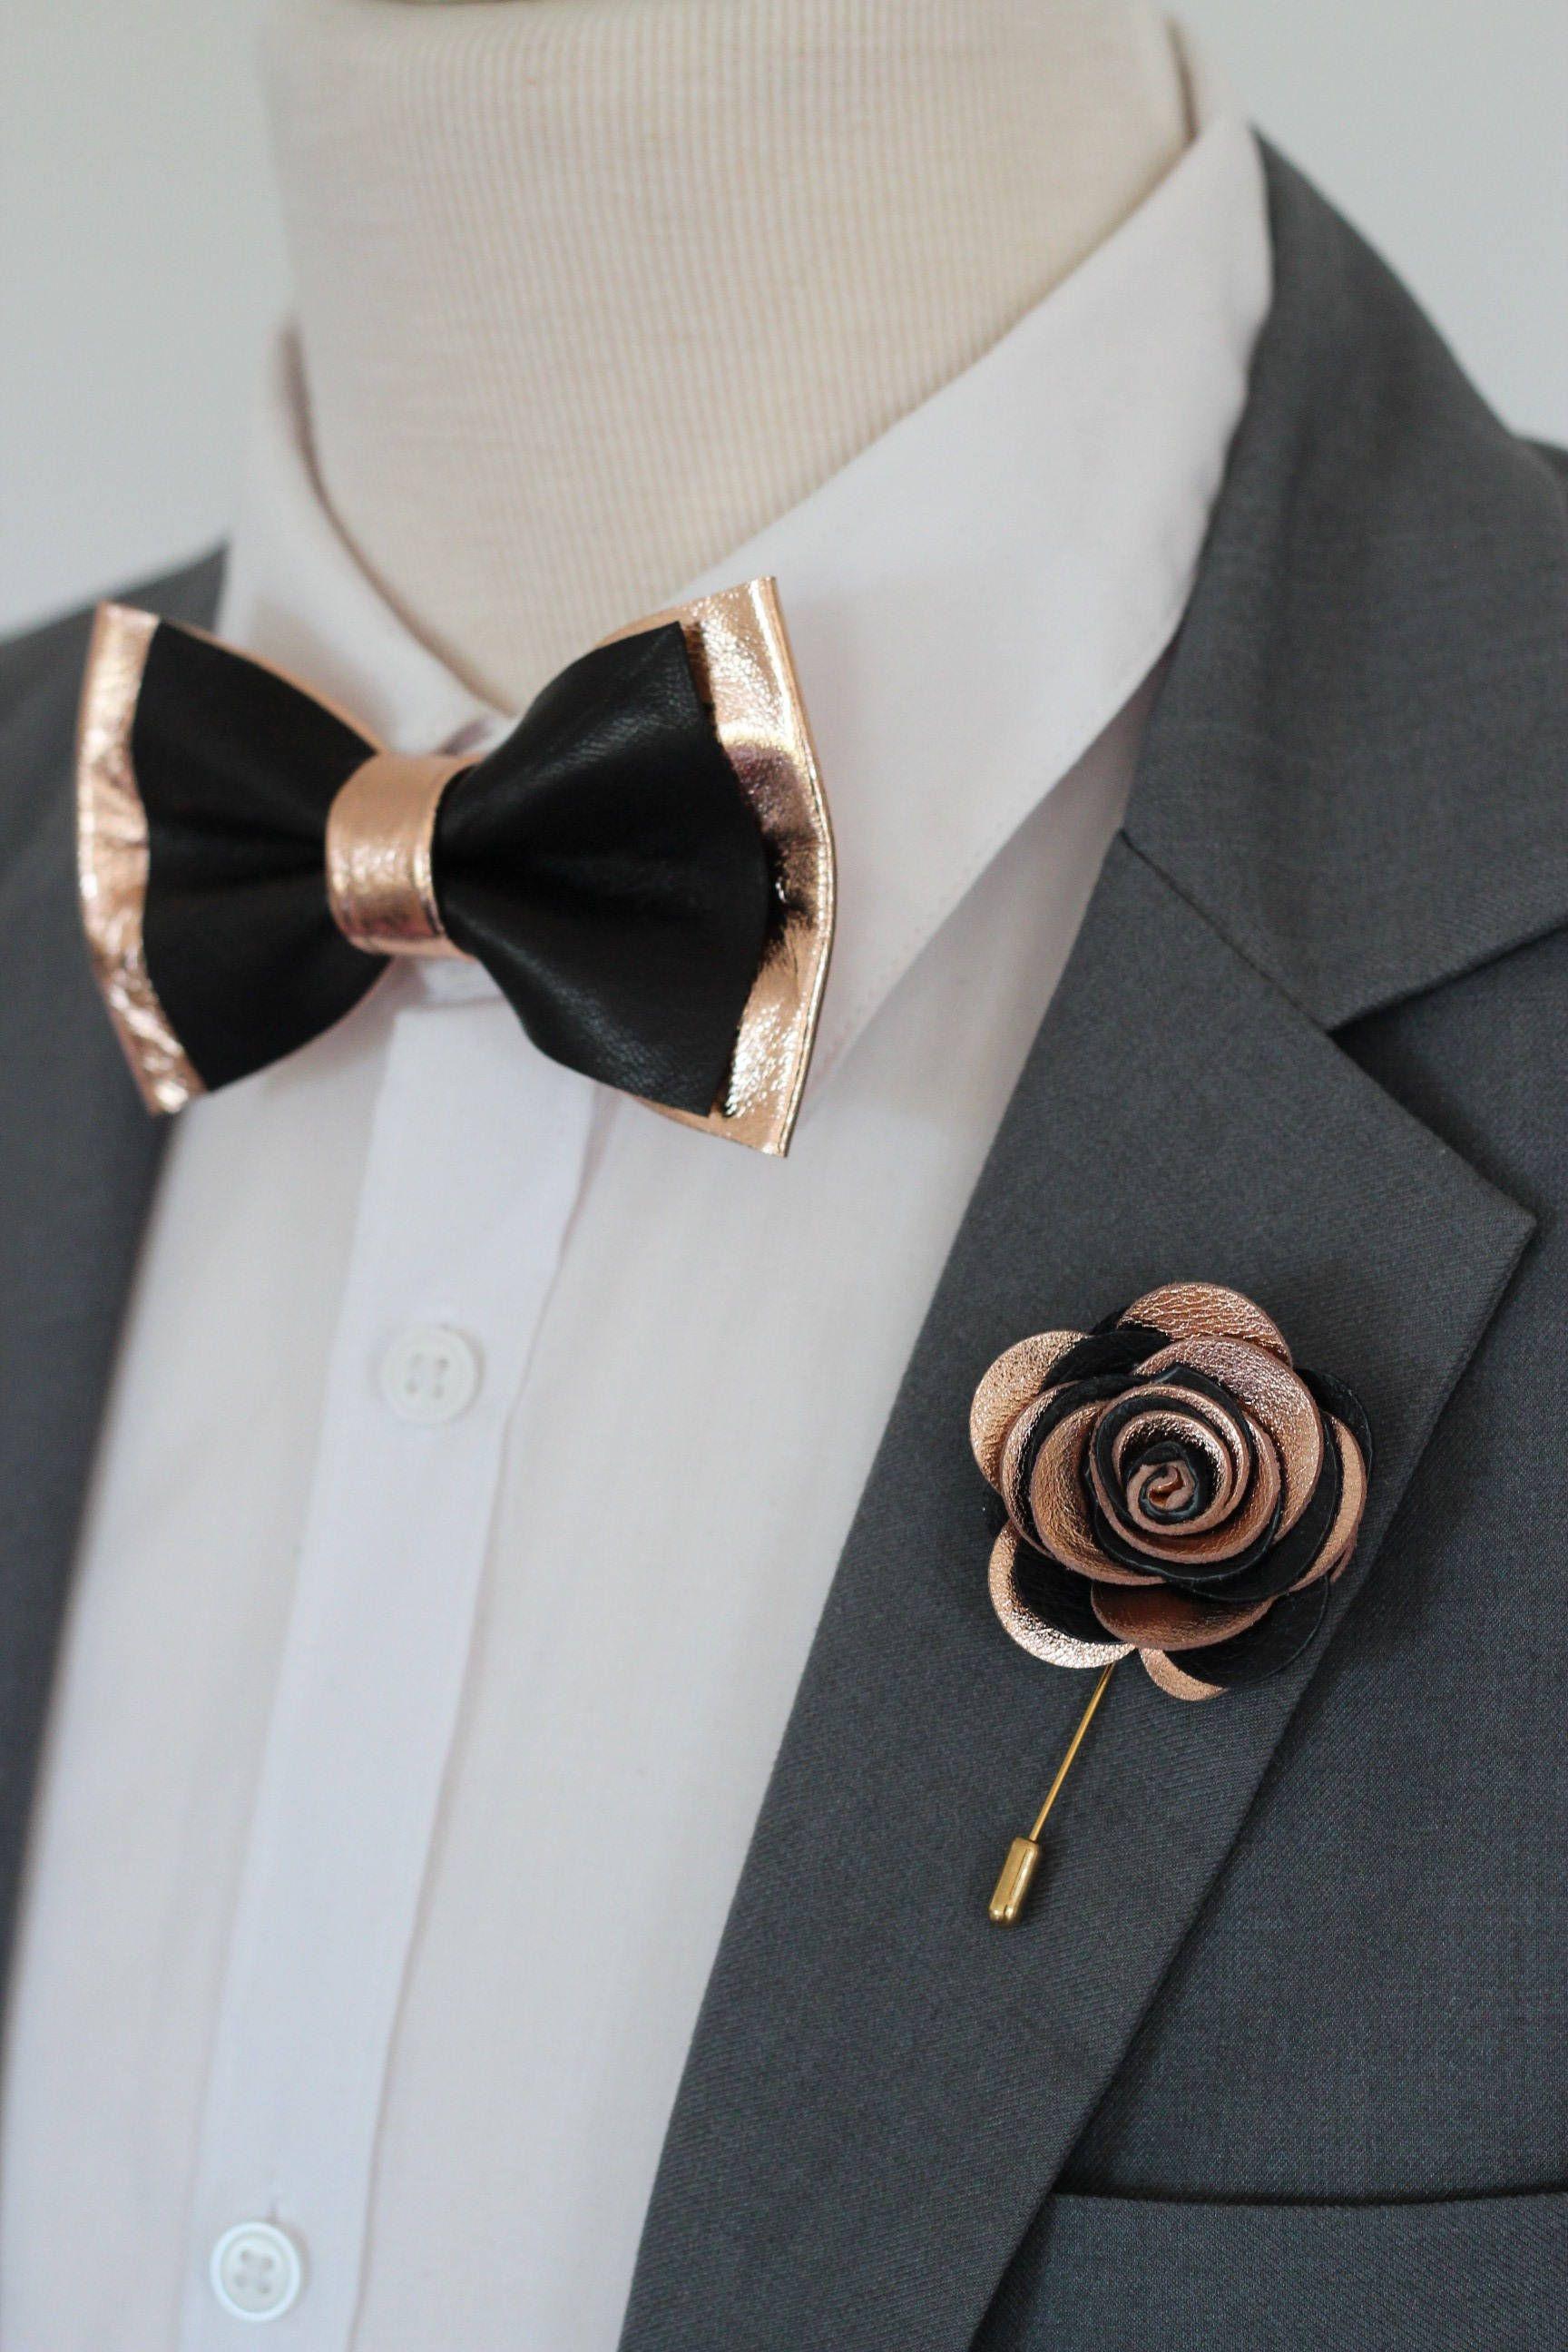 Rose Gold flower lapel pin,bow tie,rose gold wedding